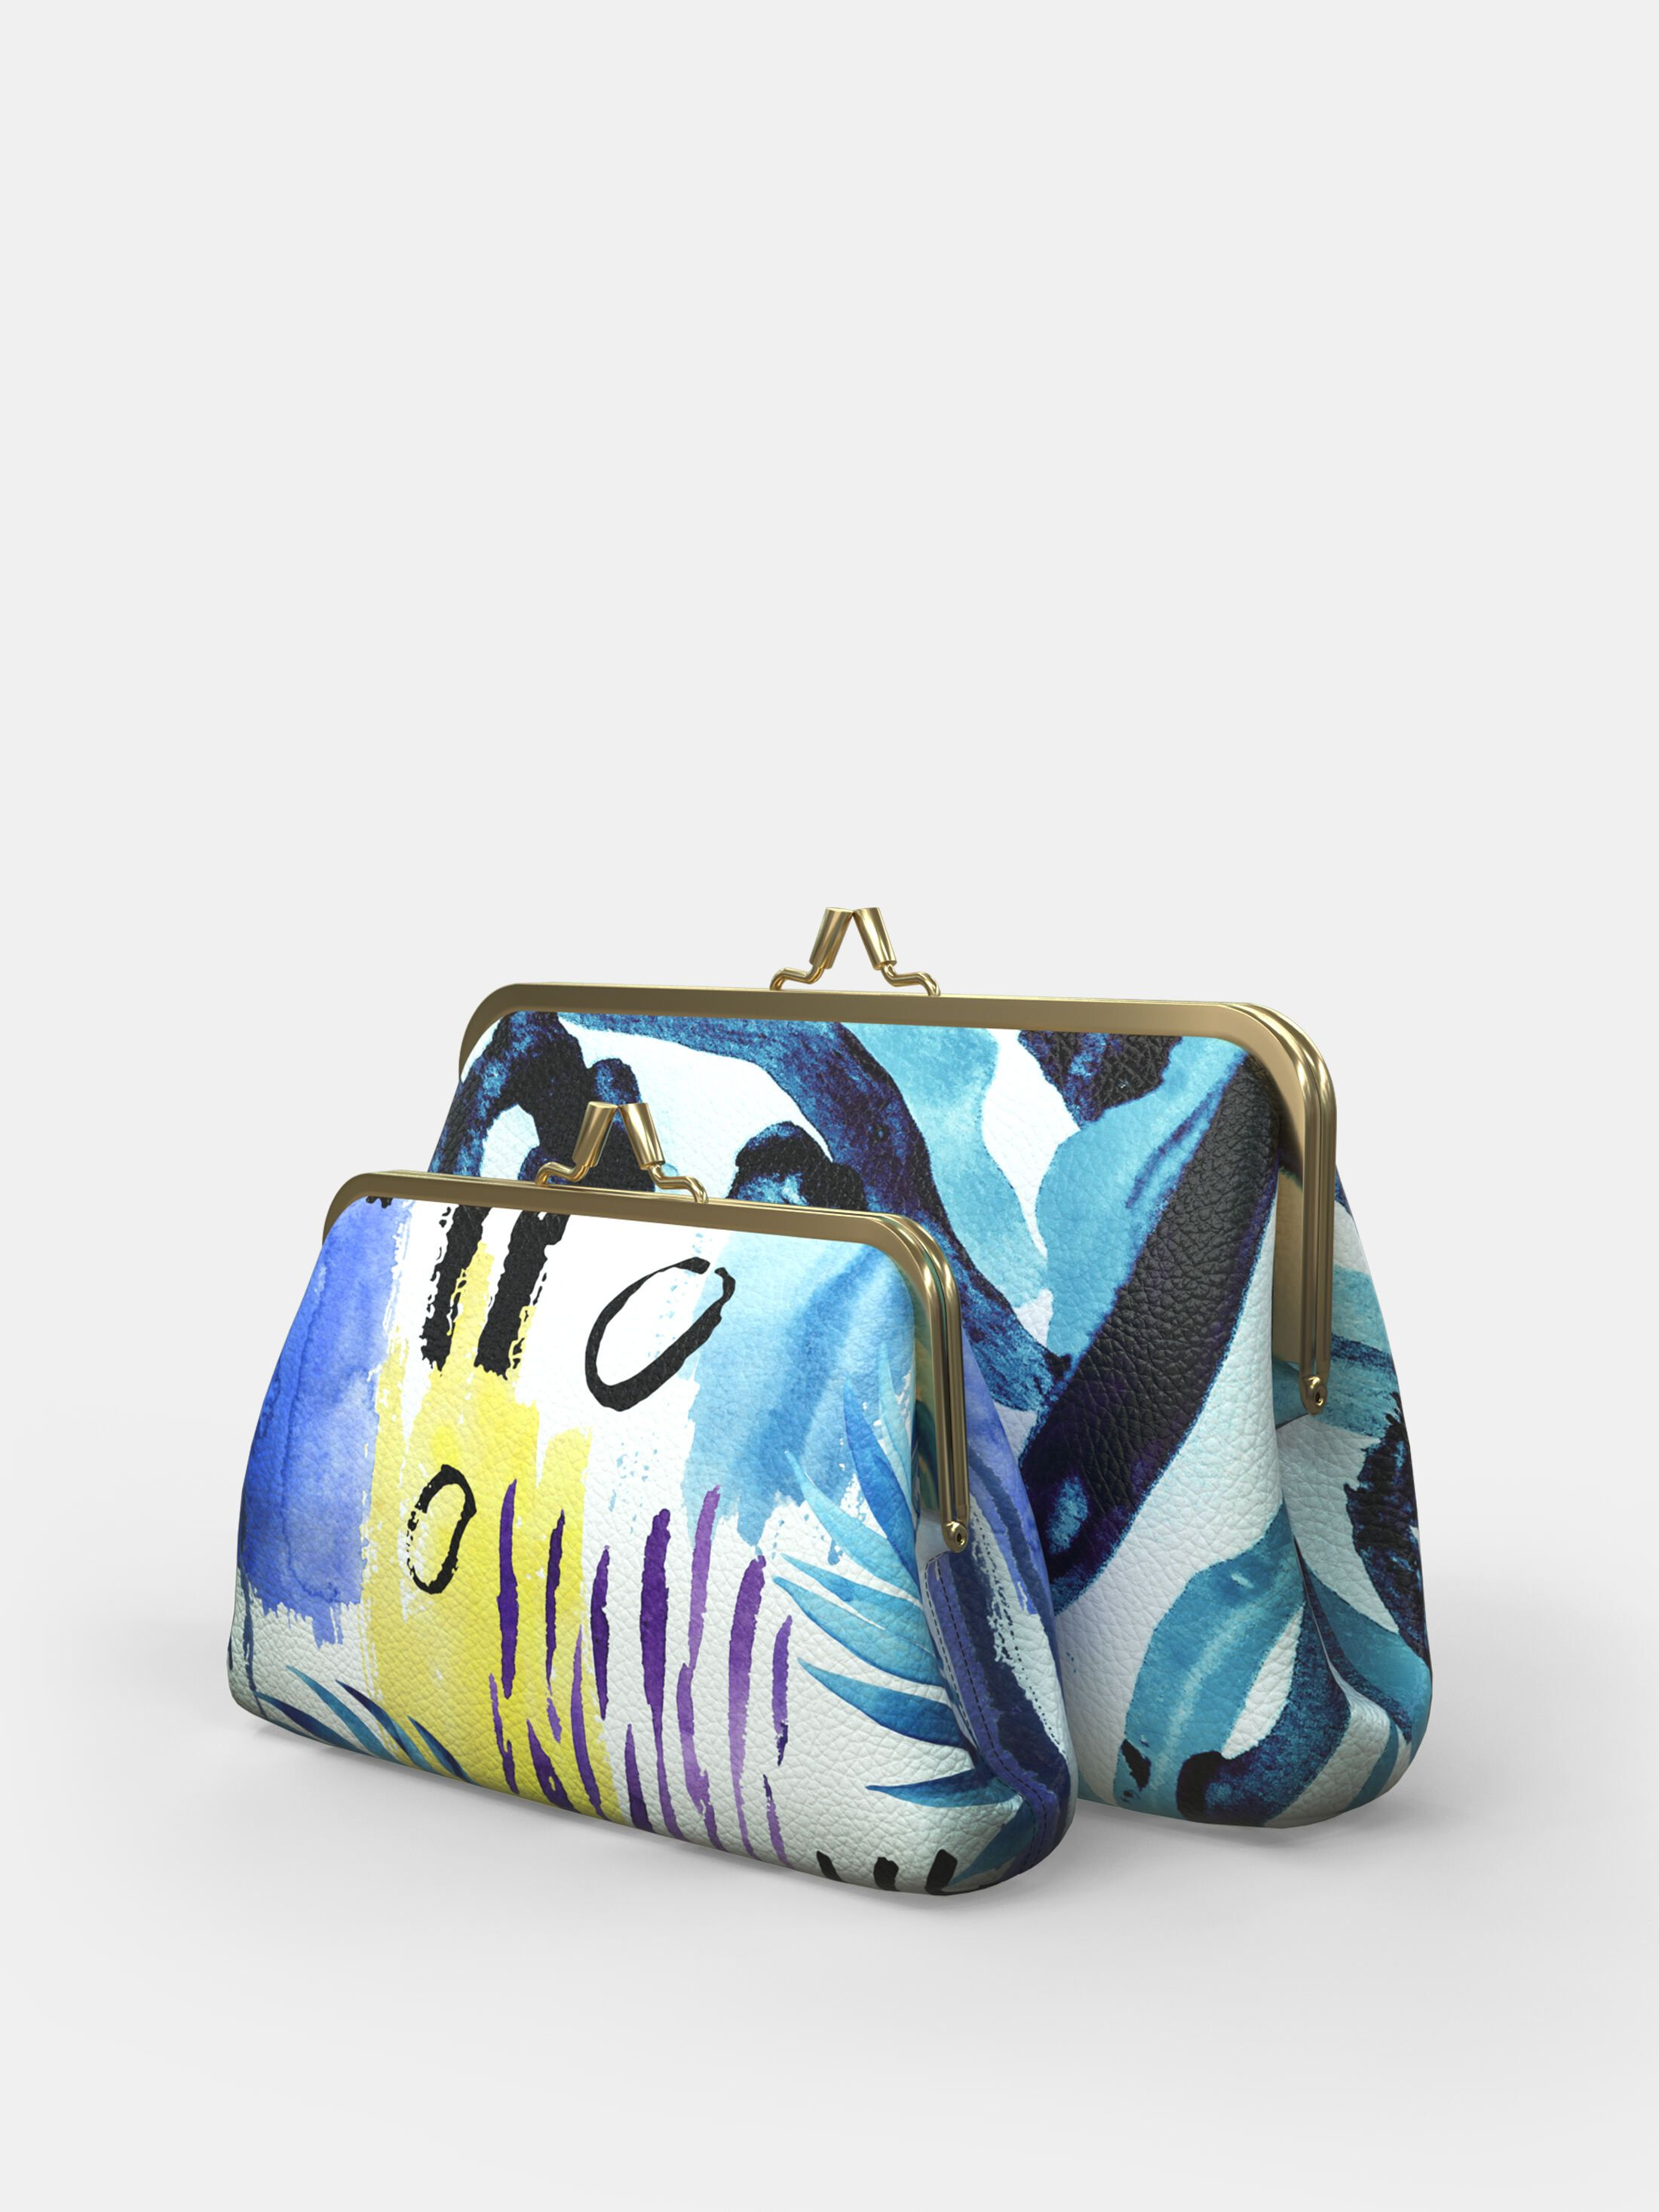 Custom metal frame bag sizes